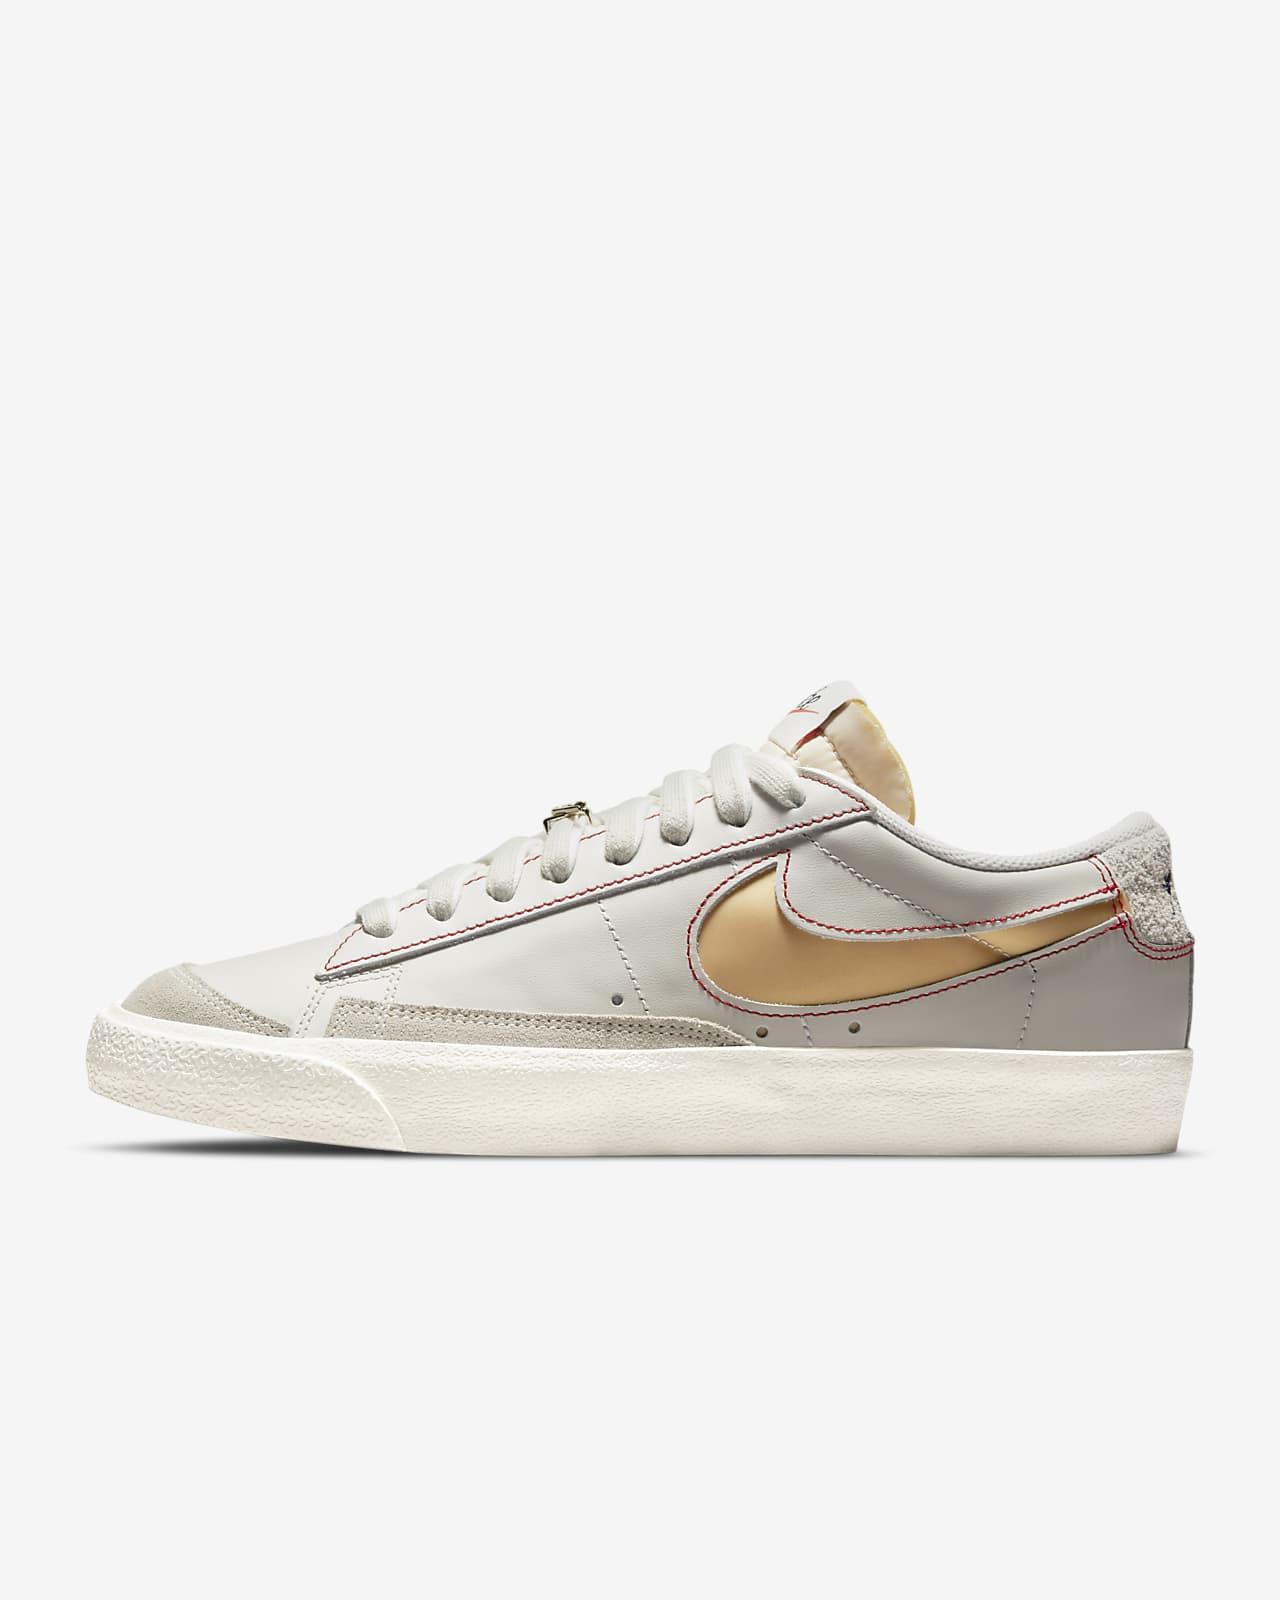 Nike Blazer Low '77 PRM 男子运动鞋